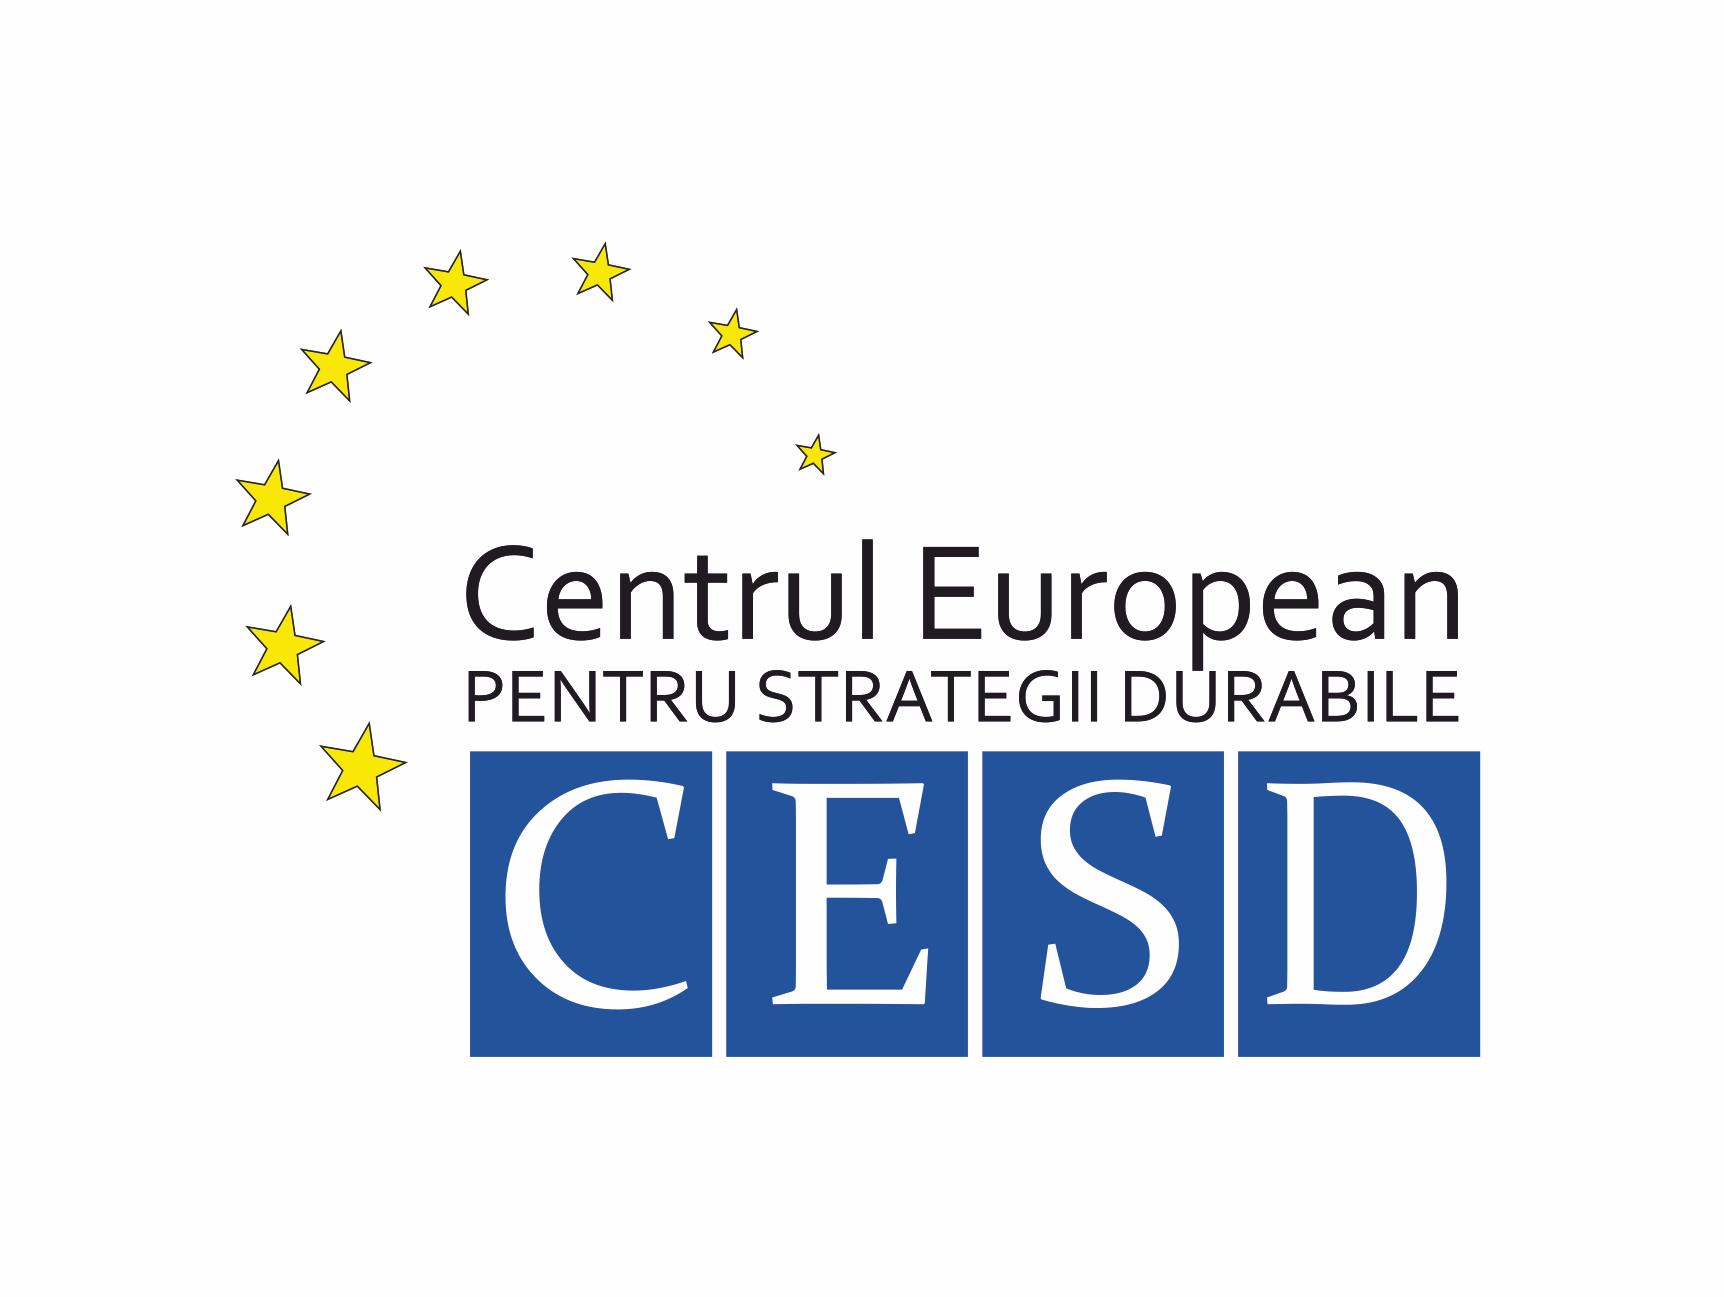 Centrul European pentru Strategii Durabile logo